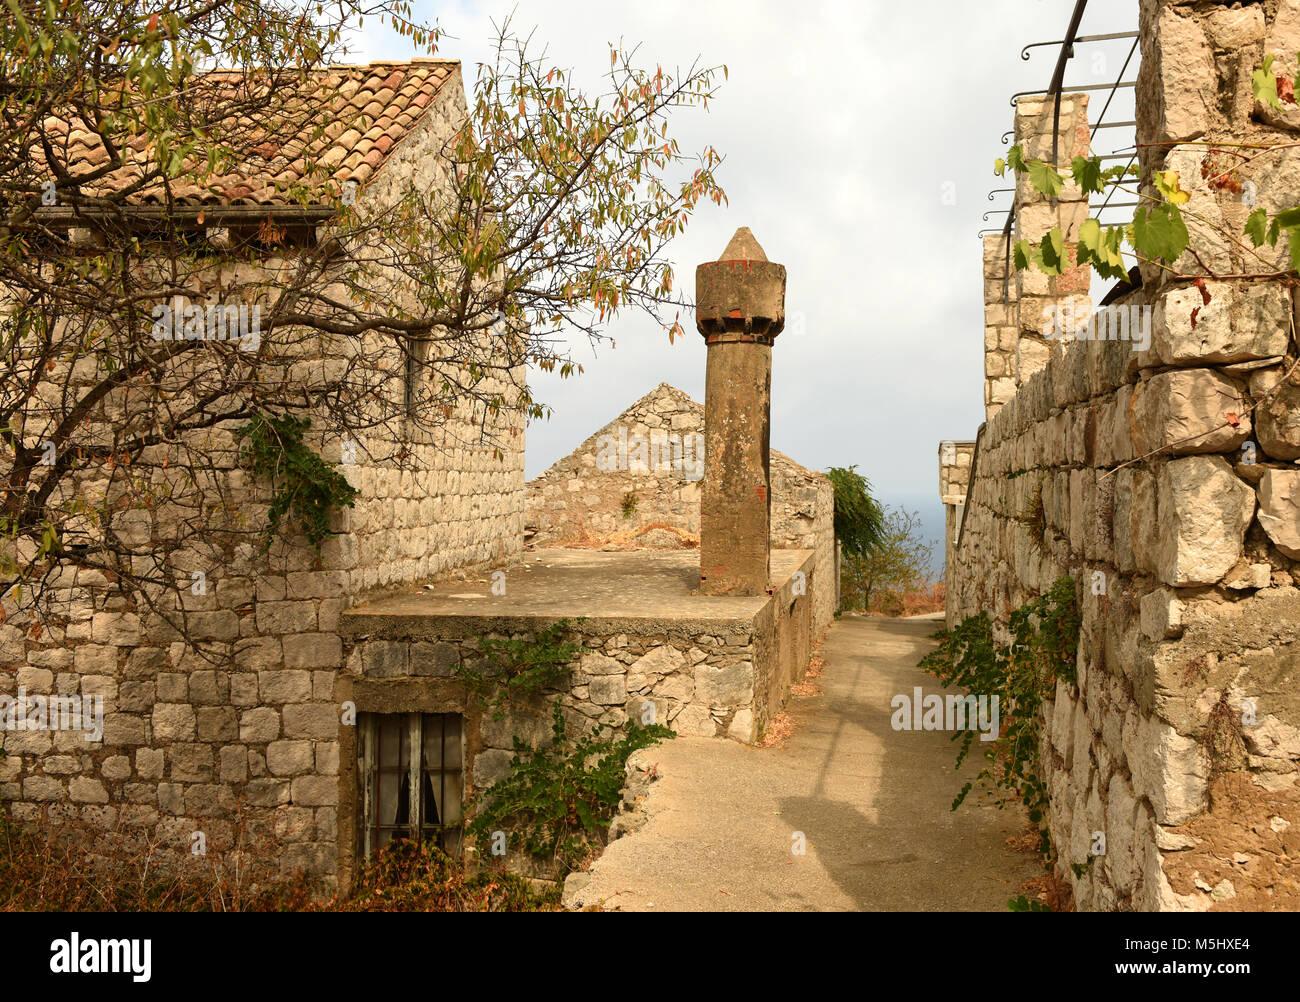 Lastovo old town on island of Lastovo, Croatia - Stock Image